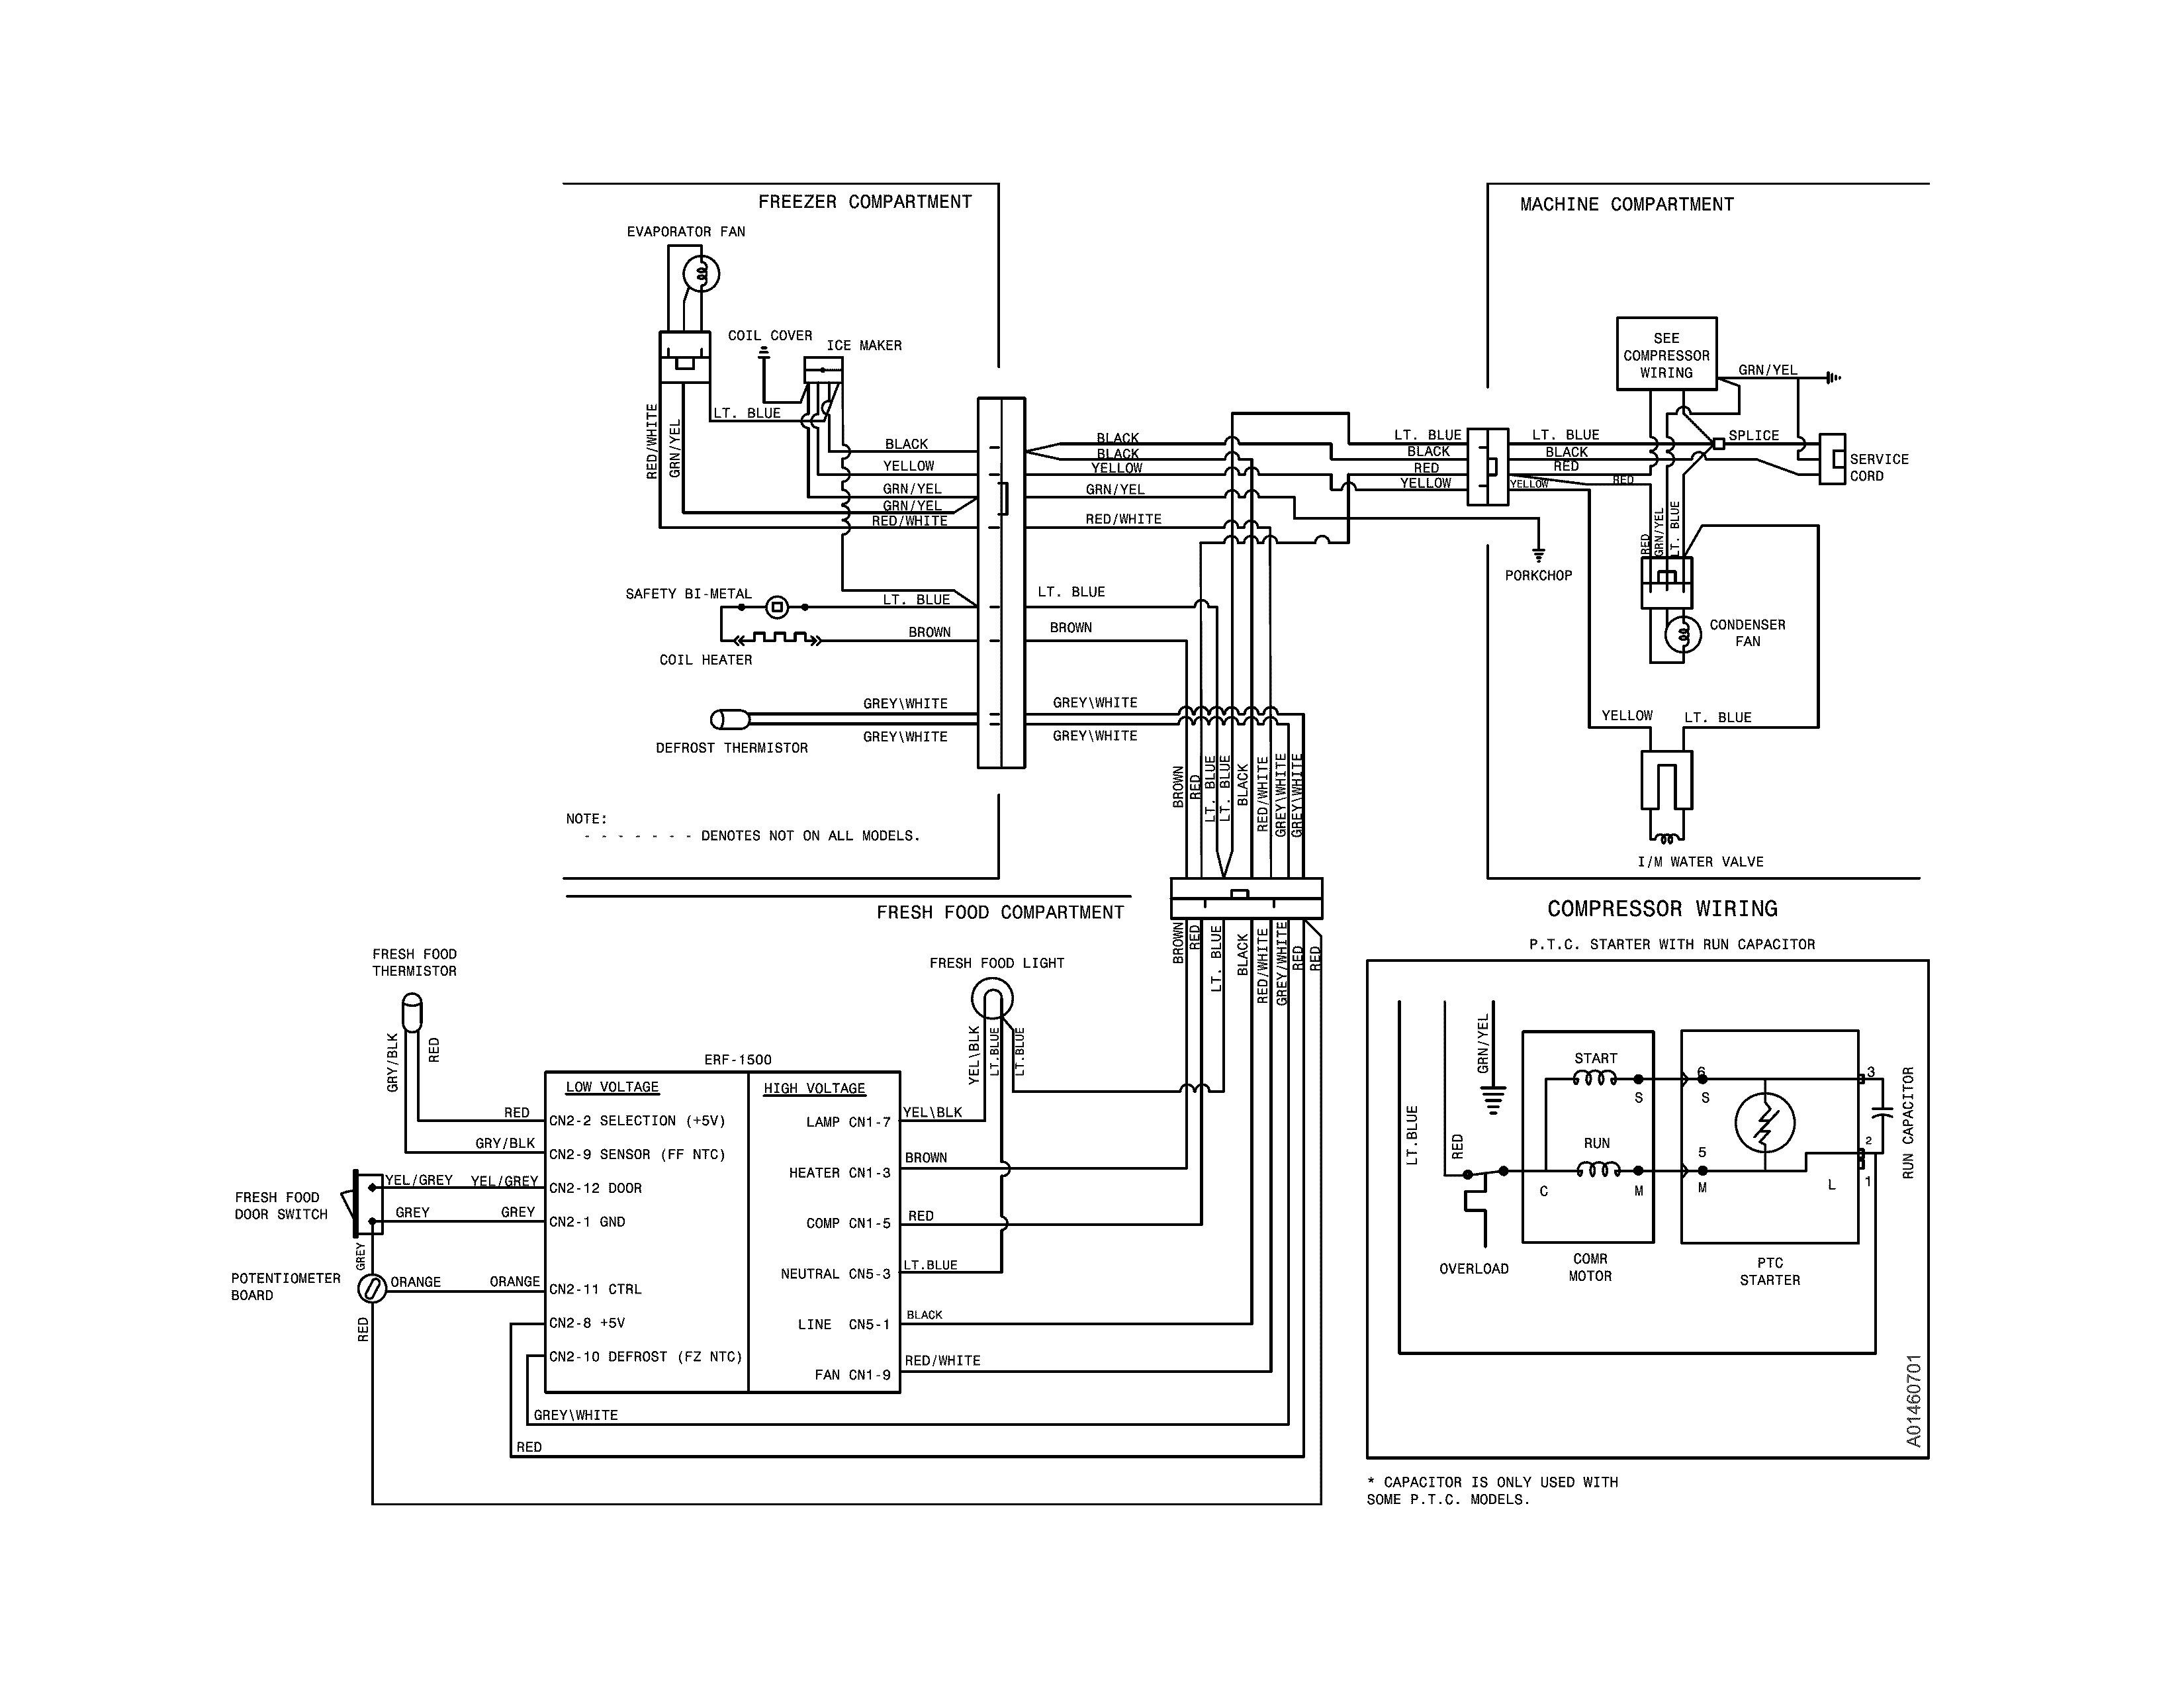 9E857 Wiring Diagram Kenmore Dishwasher | Digital Resources on westinghouse wiring diagrams, kitchenaid wiring diagrams, maytag wiring diagrams, gibson wiring diagrams, ge wiring diagrams, sears wiring diagrams, hotpoint wiring diagrams, frigidaire wiring diagrams, eaton wiring diagrams, craftsman wiring diagrams, whirlpool wiring diagrams, samsung wiring diagrams, hobart wiring diagrams, lg wiring diagrams, panasonic wiring diagrams, viking wiring diagrams, dacor wiring diagrams, speed queen wiring diagrams, amana wiring diagrams, buckley wiring diagrams,